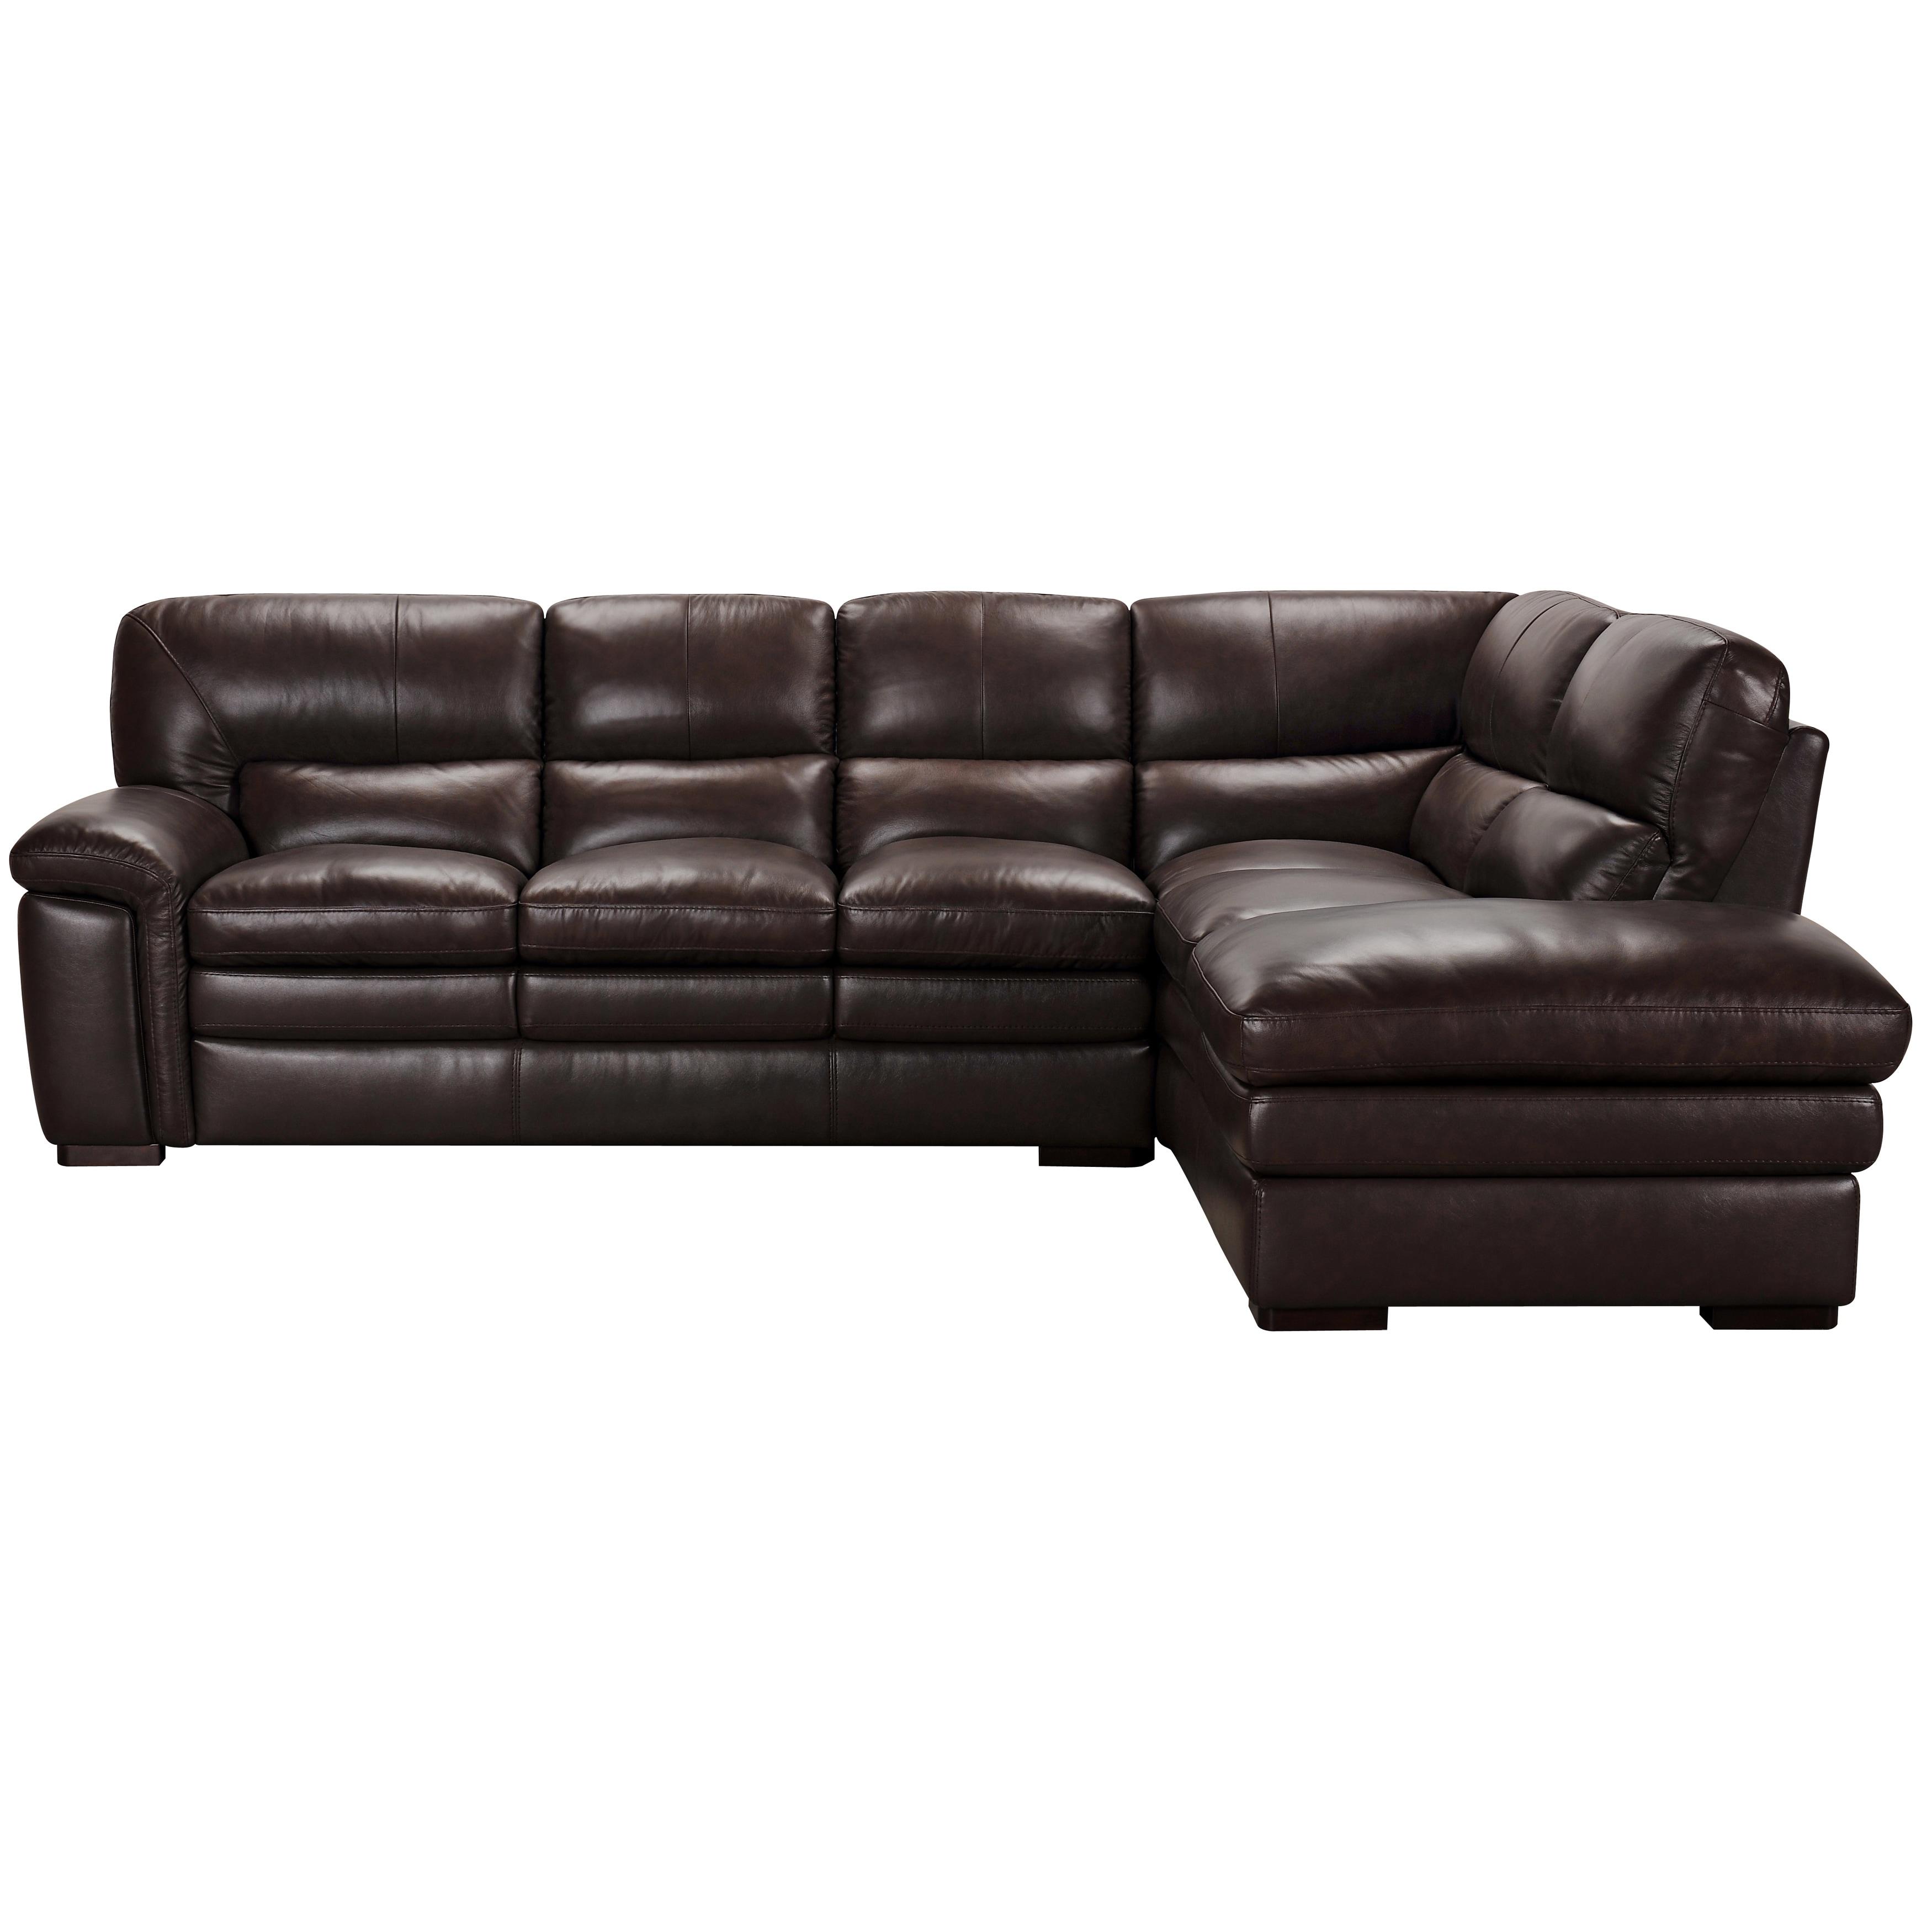 Portland Premium Top Grain Brown Leather Sectional Sofa